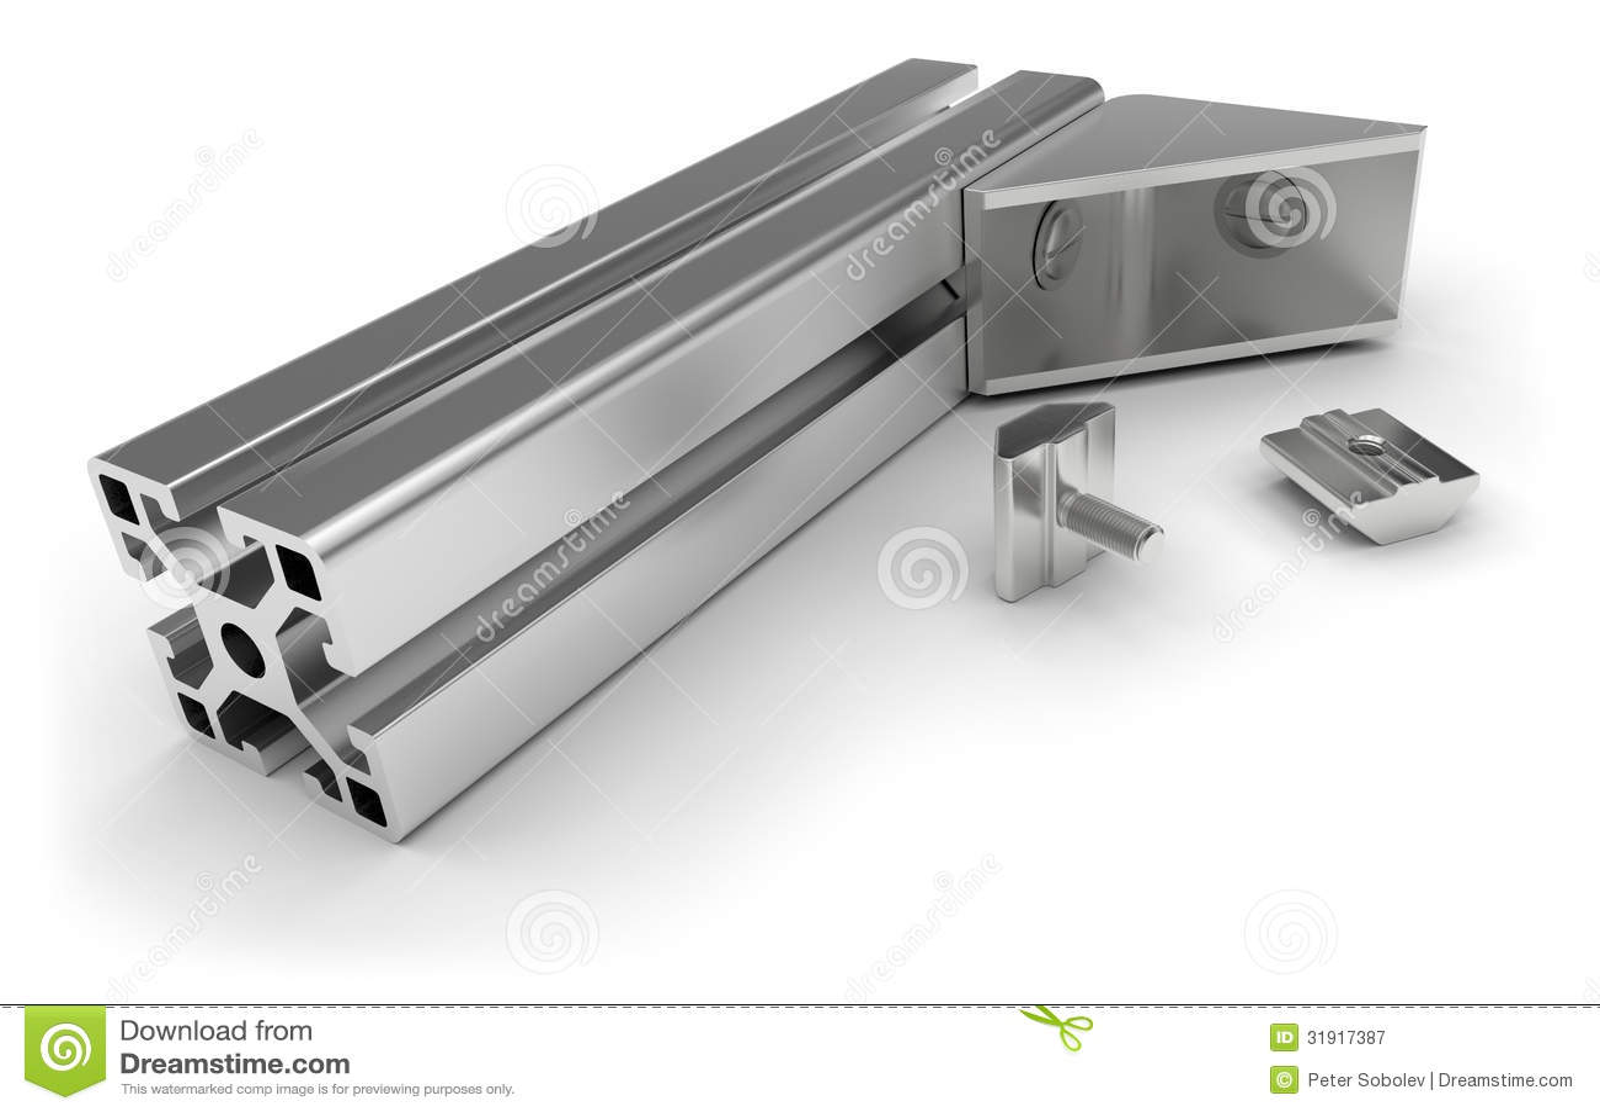 aluminum profile accessories stock illustration illustration of industry parts 31917387. Black Bedroom Furniture Sets. Home Design Ideas